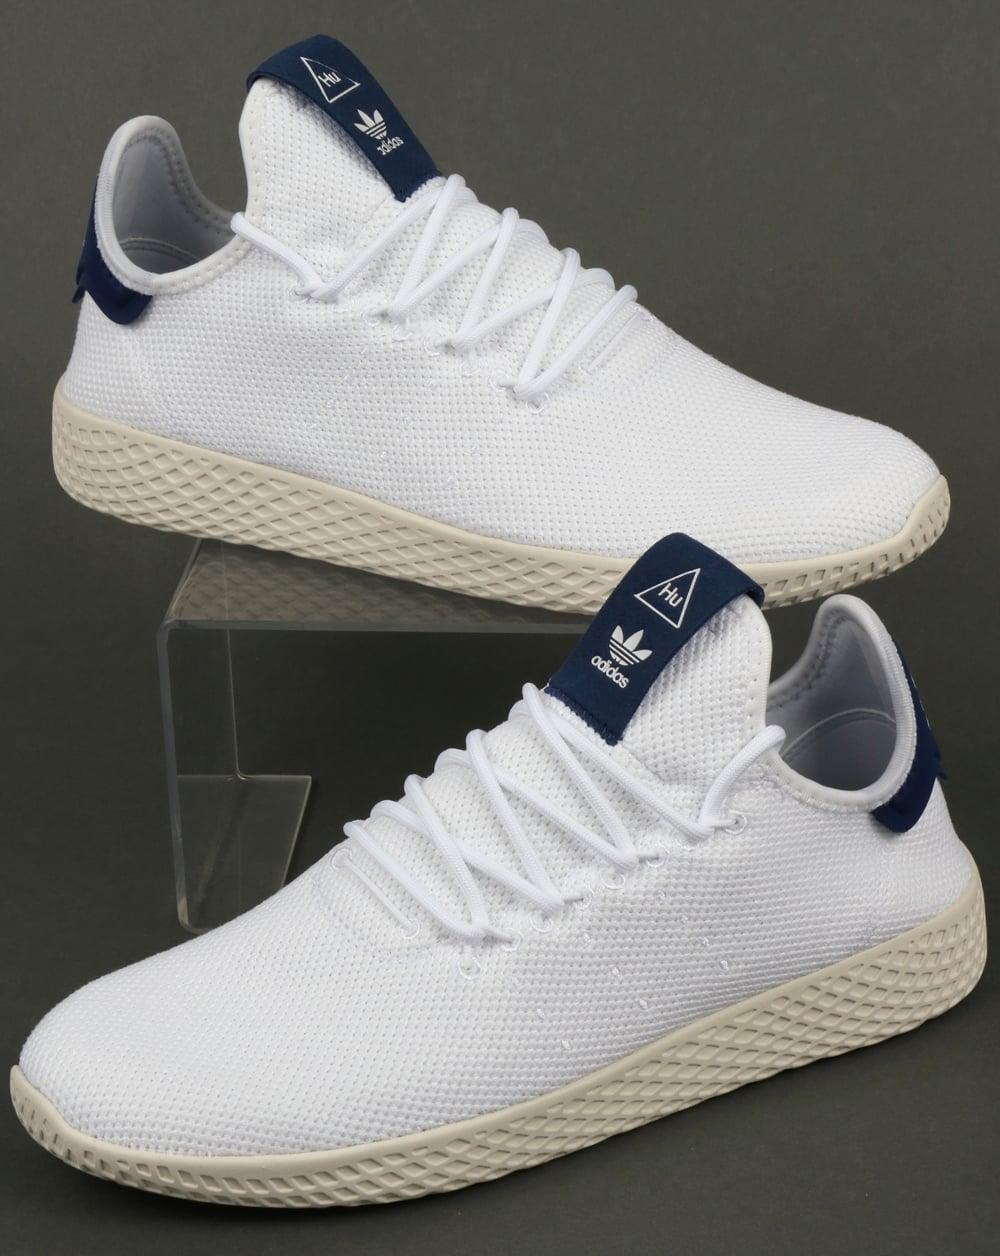 Adidas PW Tennis HU Trainers White/Navy